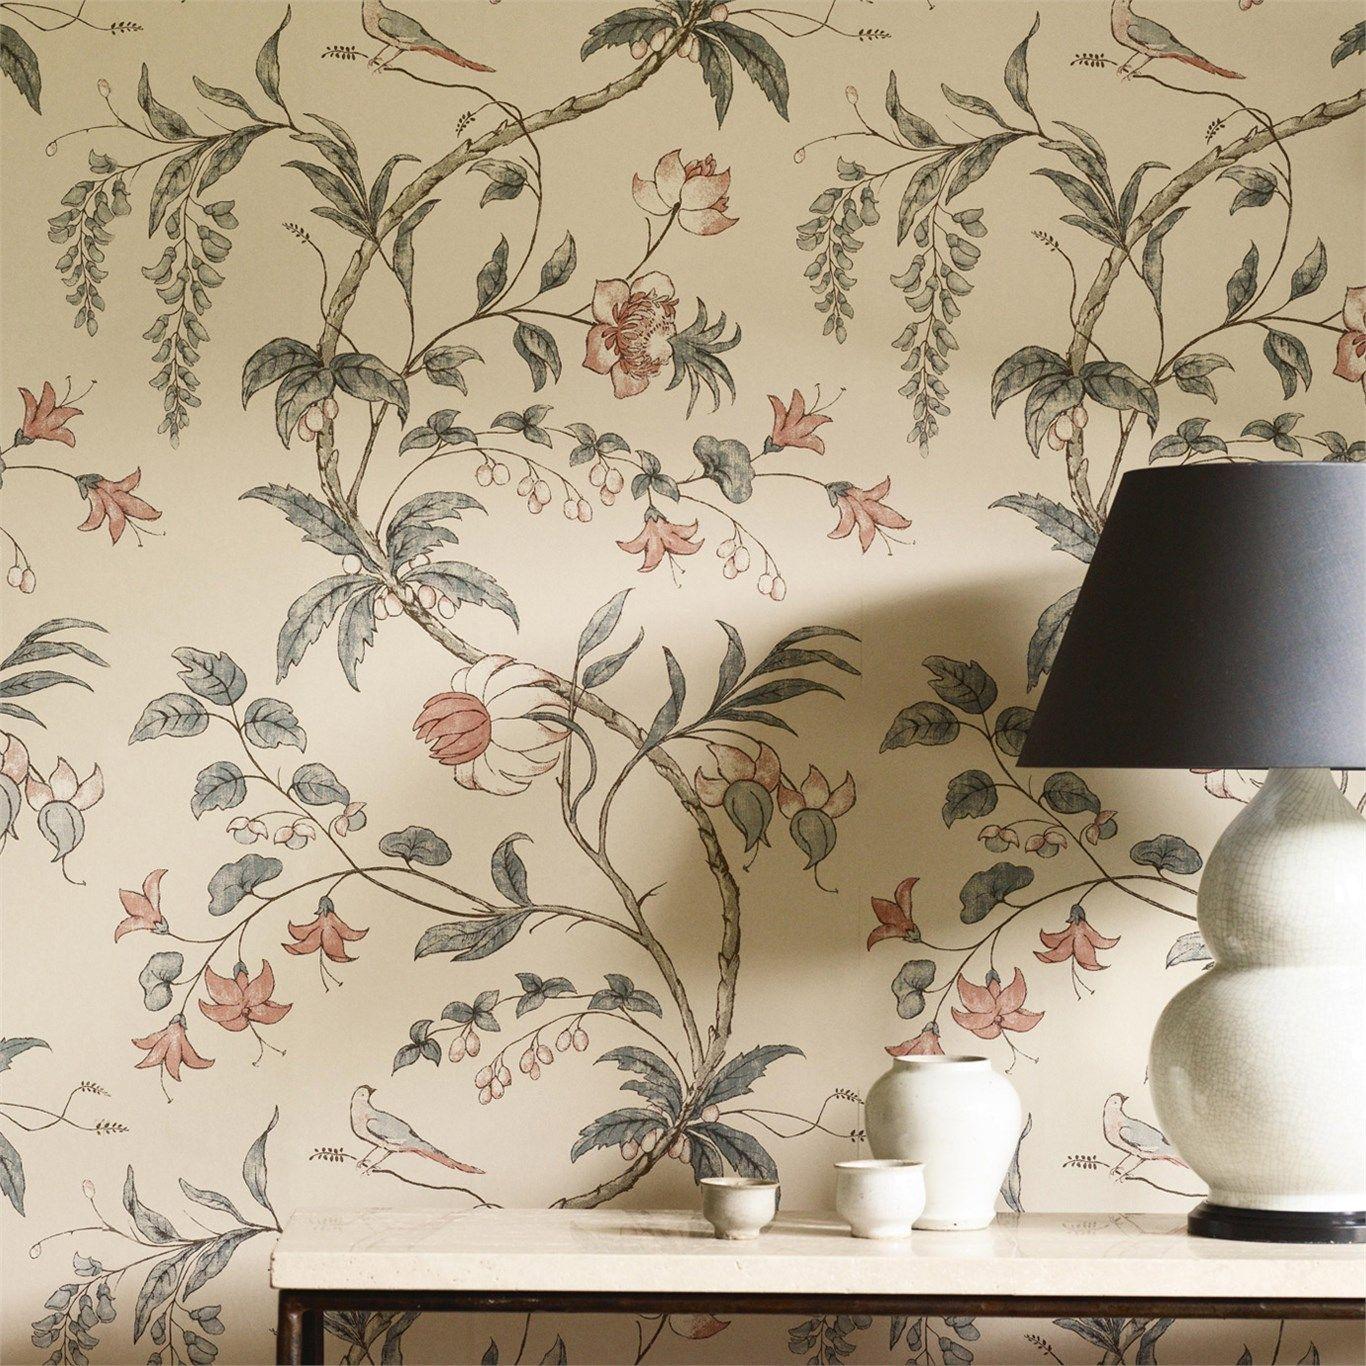 Zoffany Luxury Fabric And Wallpaper Design Products British Uk Fabric And Wallpapers Chambalon Designer Wallpaper Wallpaper Living Room Wall Coverings